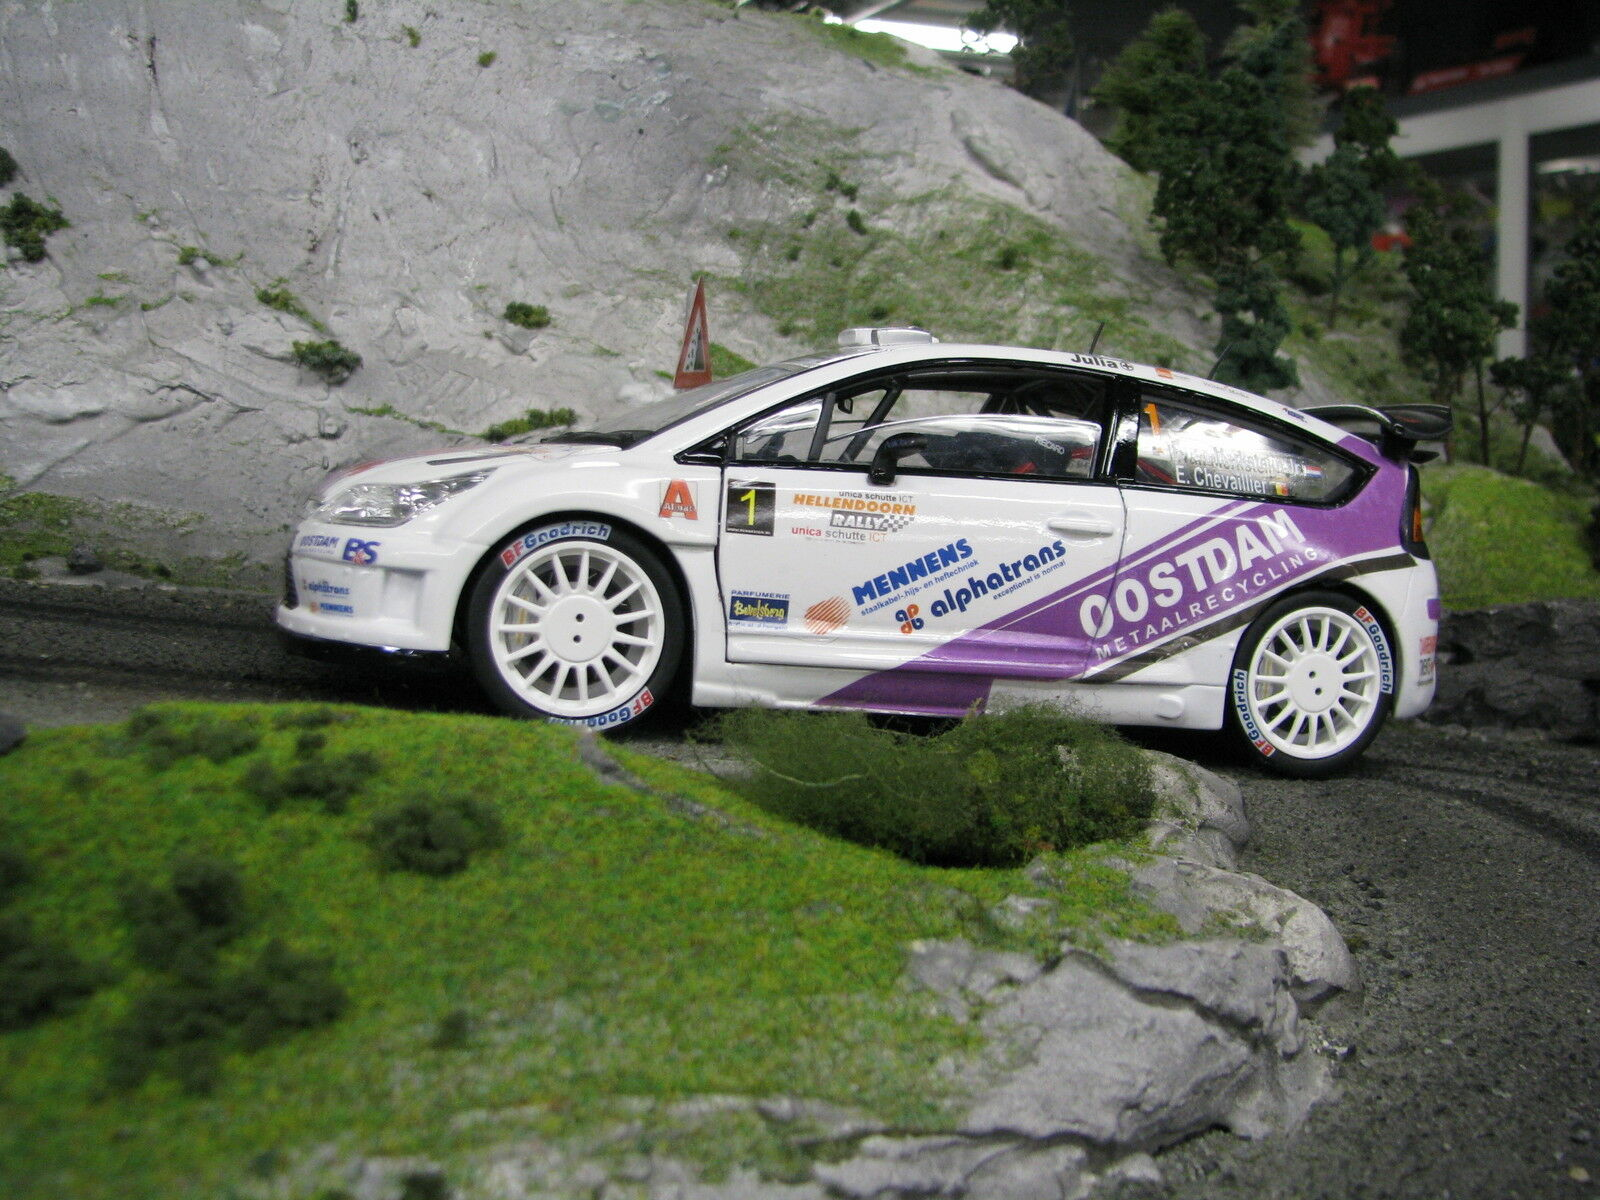 Solido Citroën C4 WRC 2012 1 18 18 18 v. Merksteijn Jr Chevallier Hellendoorn Rally ae5568